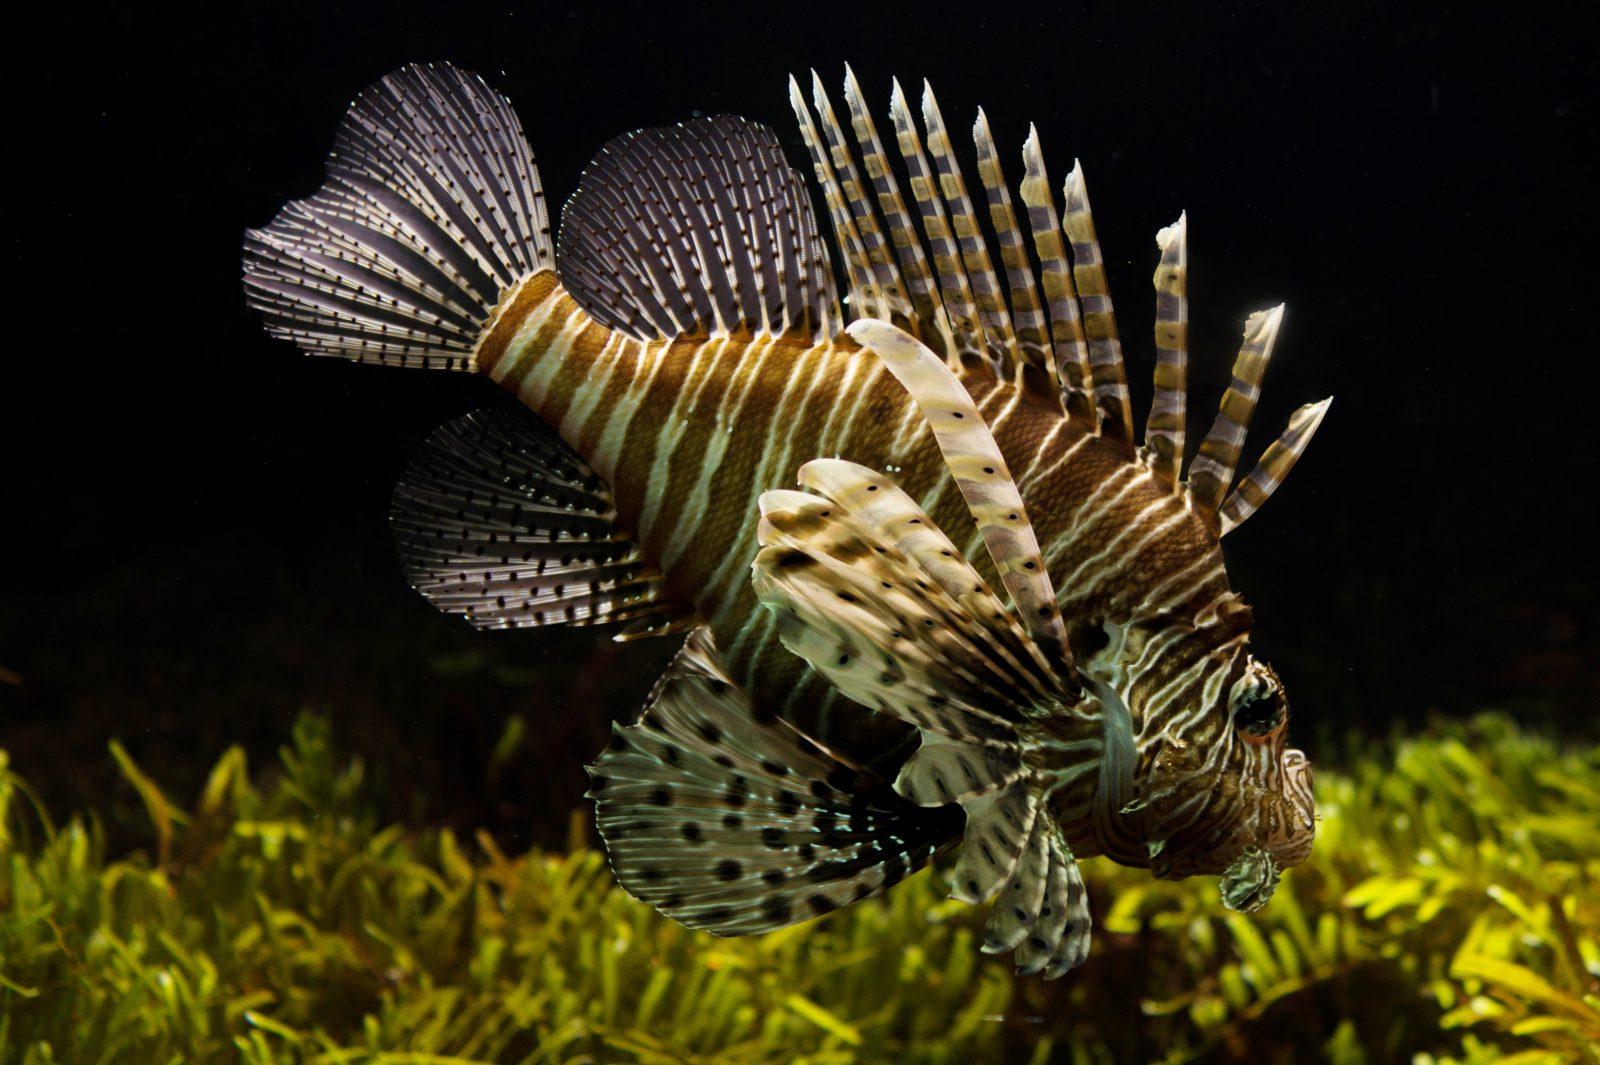 Peixe feios: os hábitos alimentares do peixe ornamental pode variar bastante.